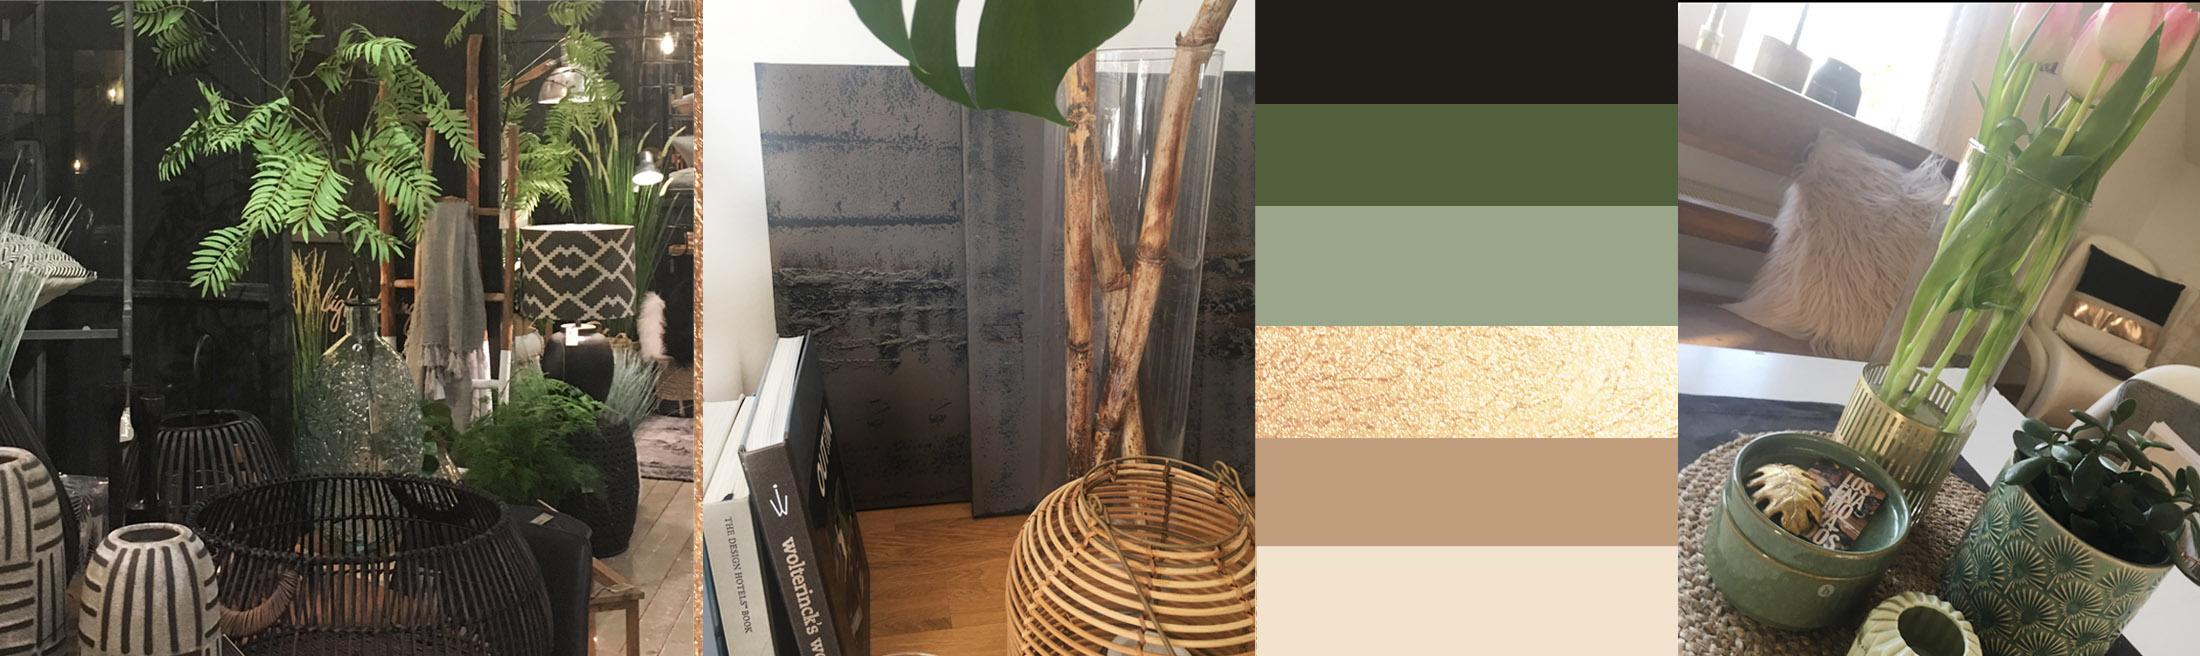 Kreativ-Fee_Kommunikationsdesign_Farben_Material_Beratung